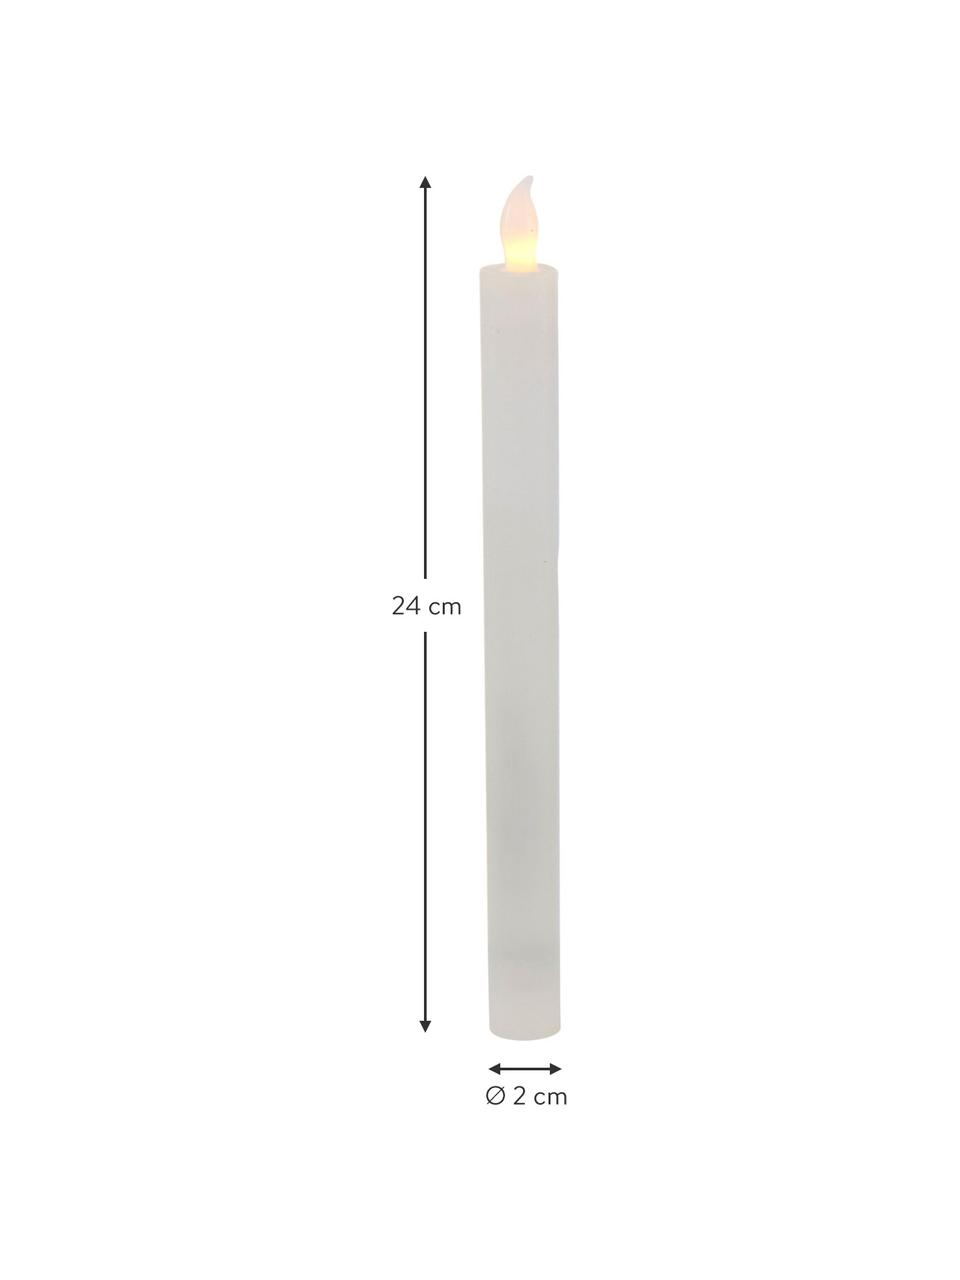 LED Kerzen Vilago, 2 Stück, Wachs, Weiß, Ø 2 x H 24 cm